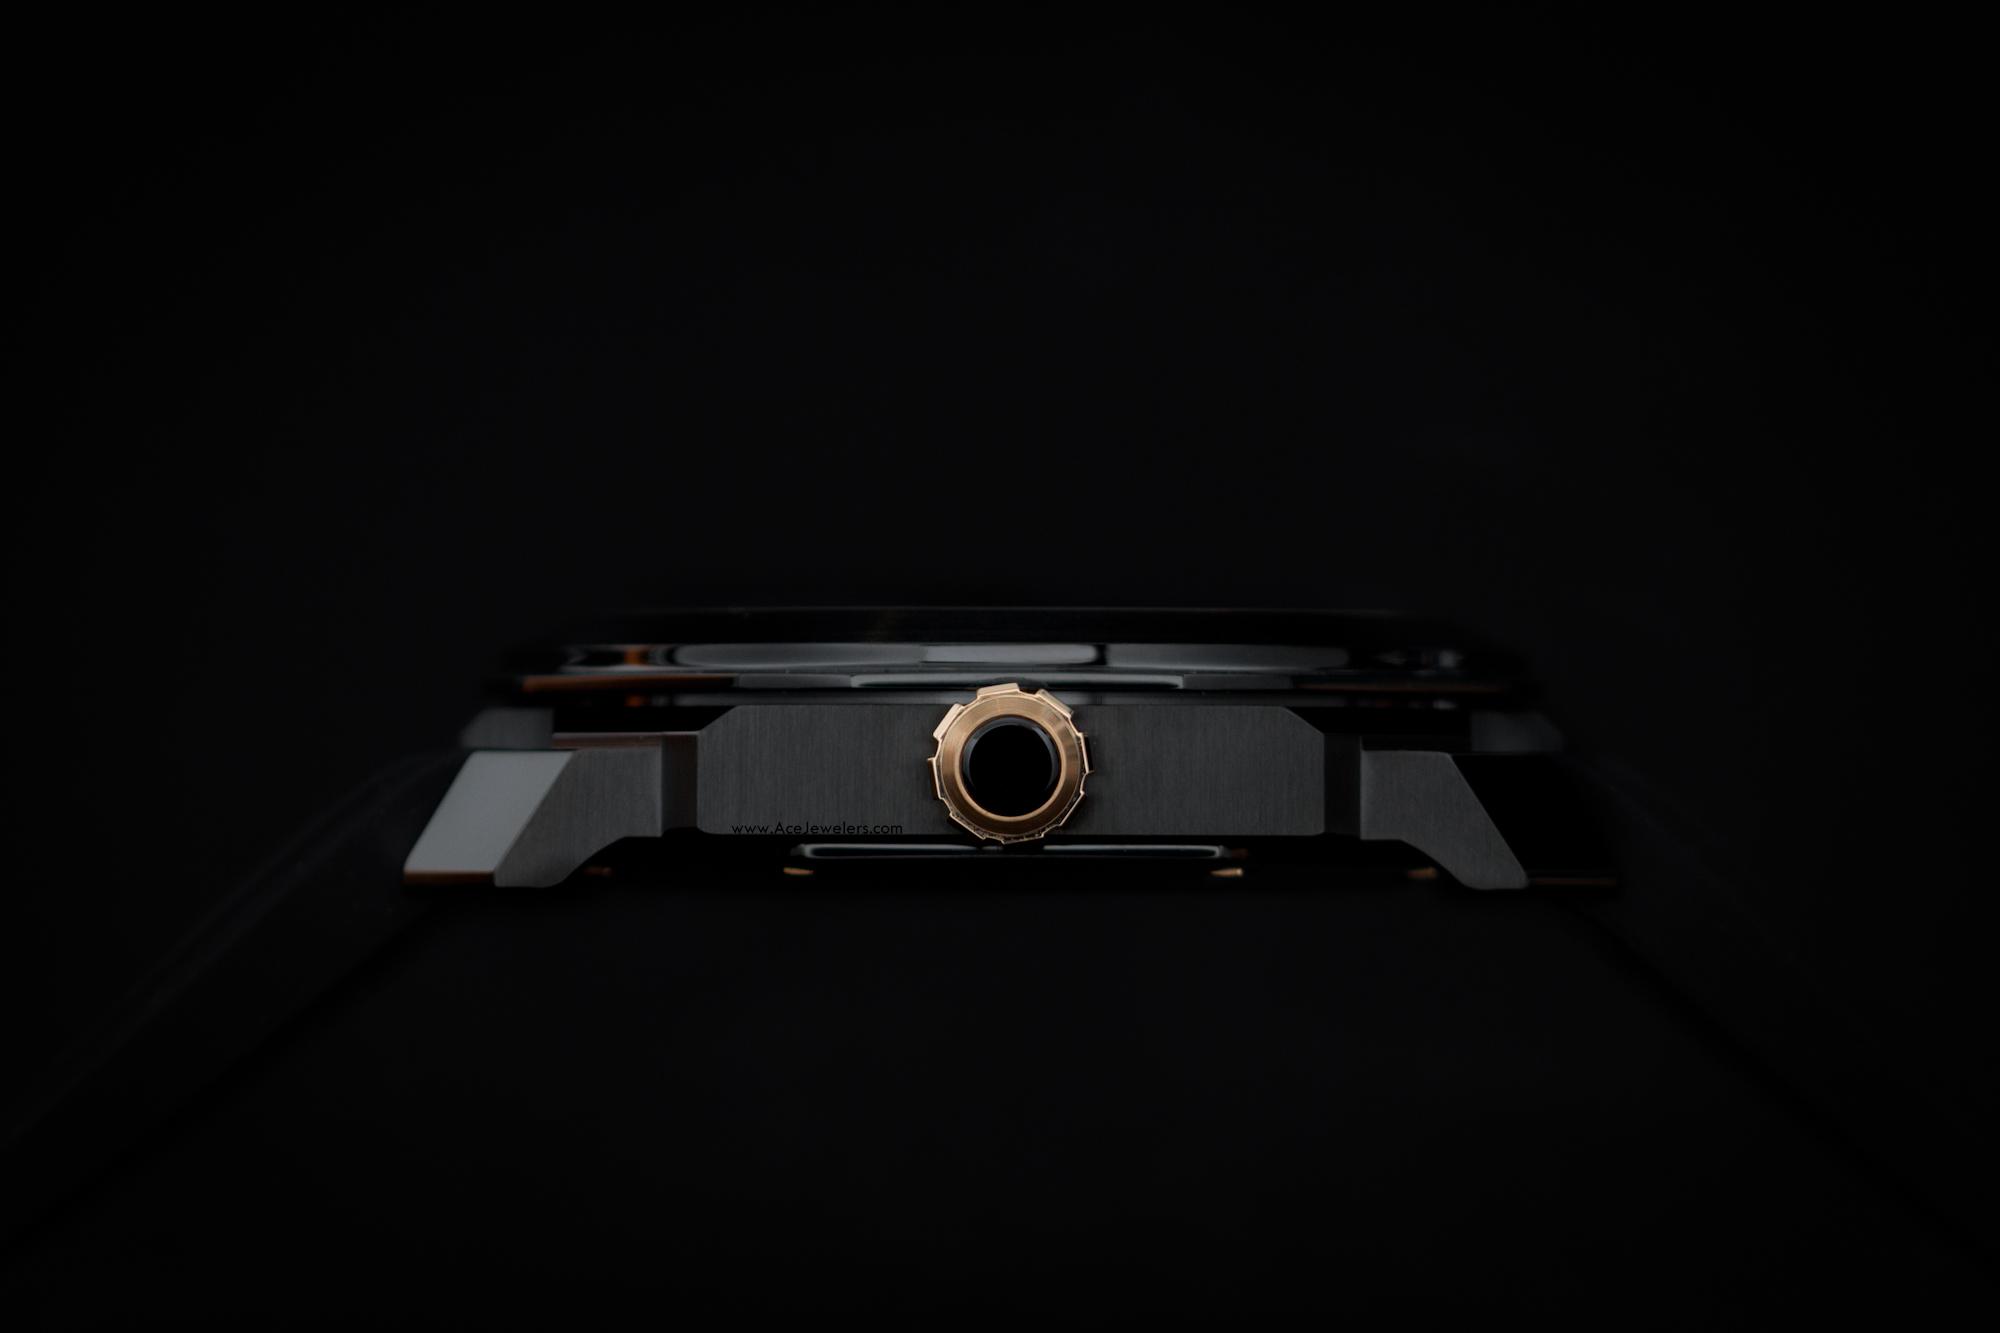 bulgari octo ultranero black & pink gold rubber strap ace jewelers amsterdam-1 (1)